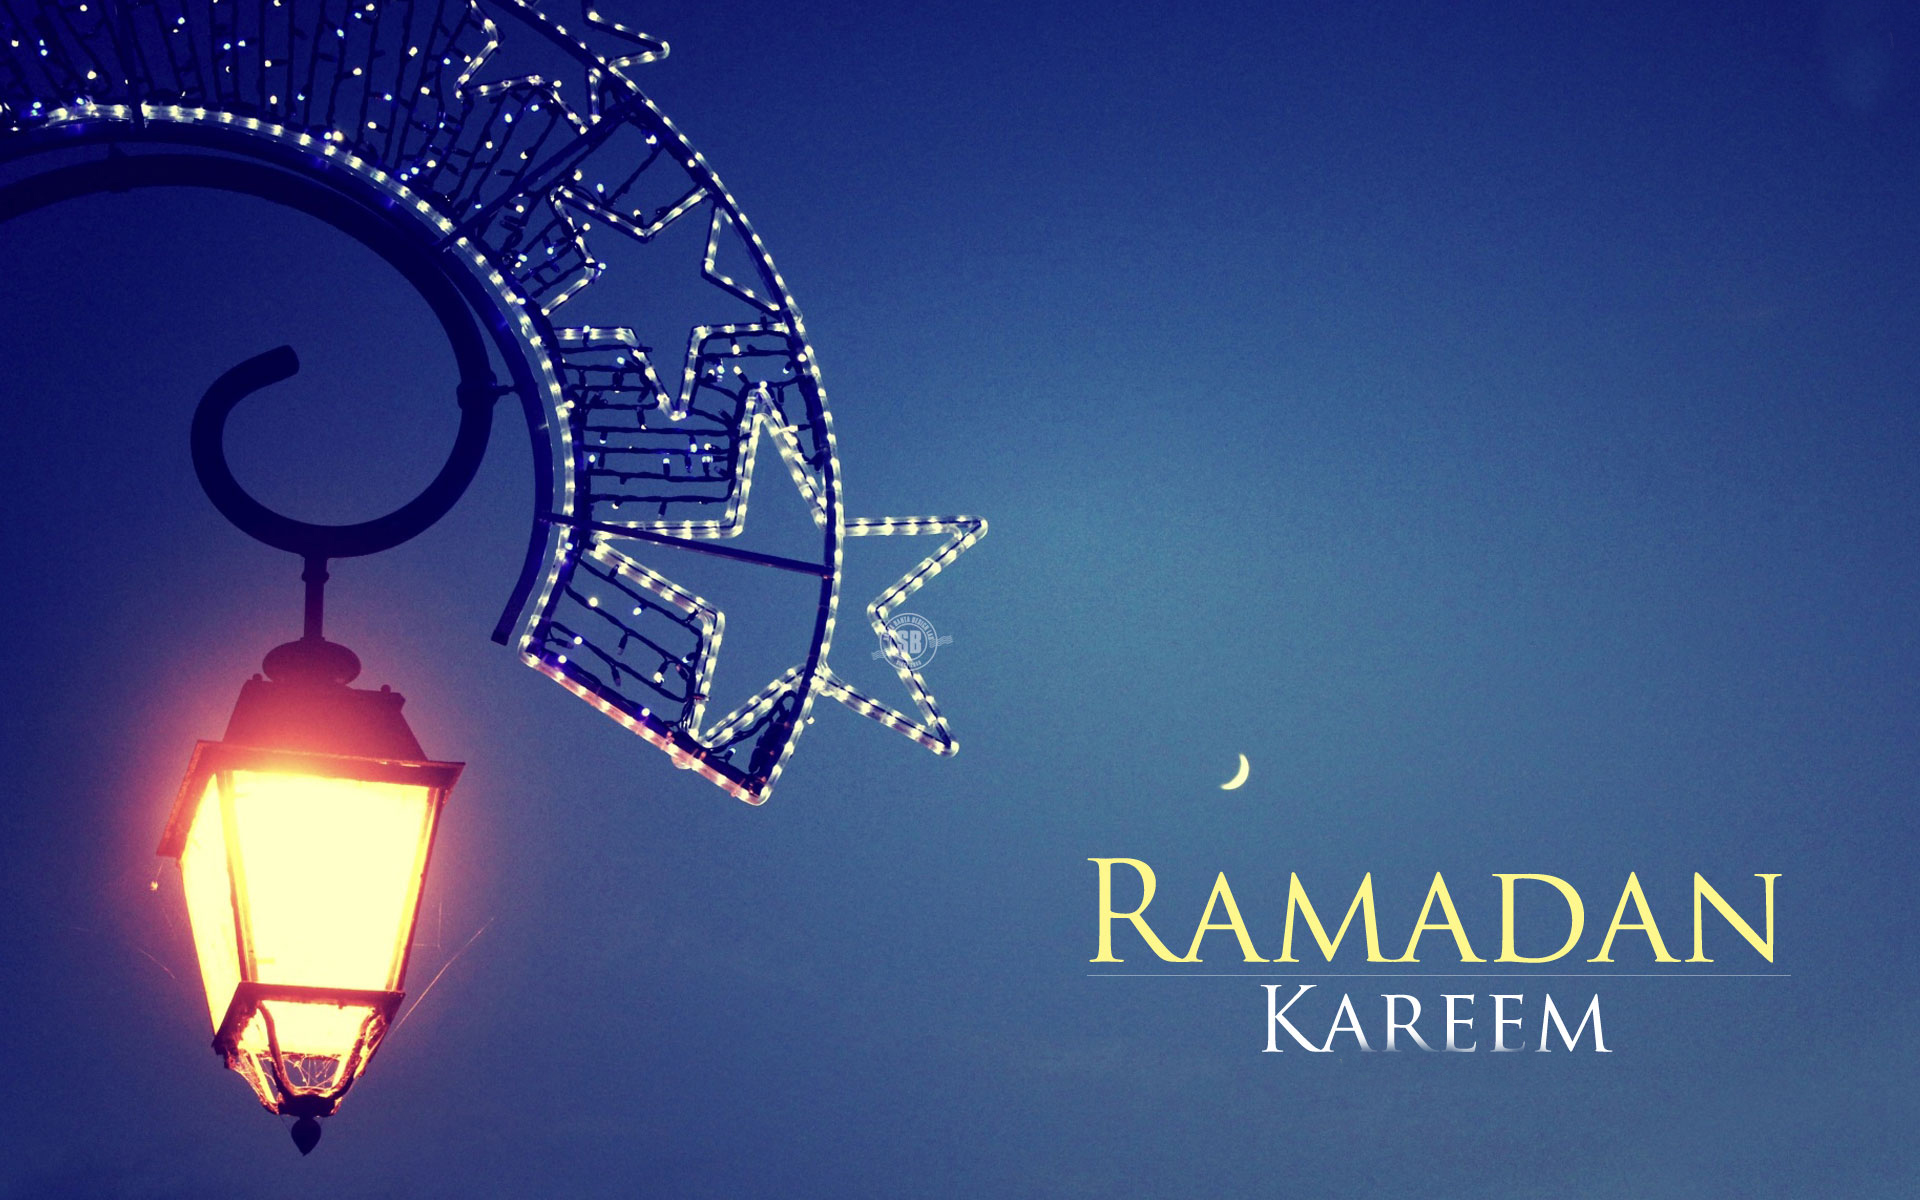 صوره خلفيات عن رمضان , غير شكل موبايلك و خليه استايل رمضانى